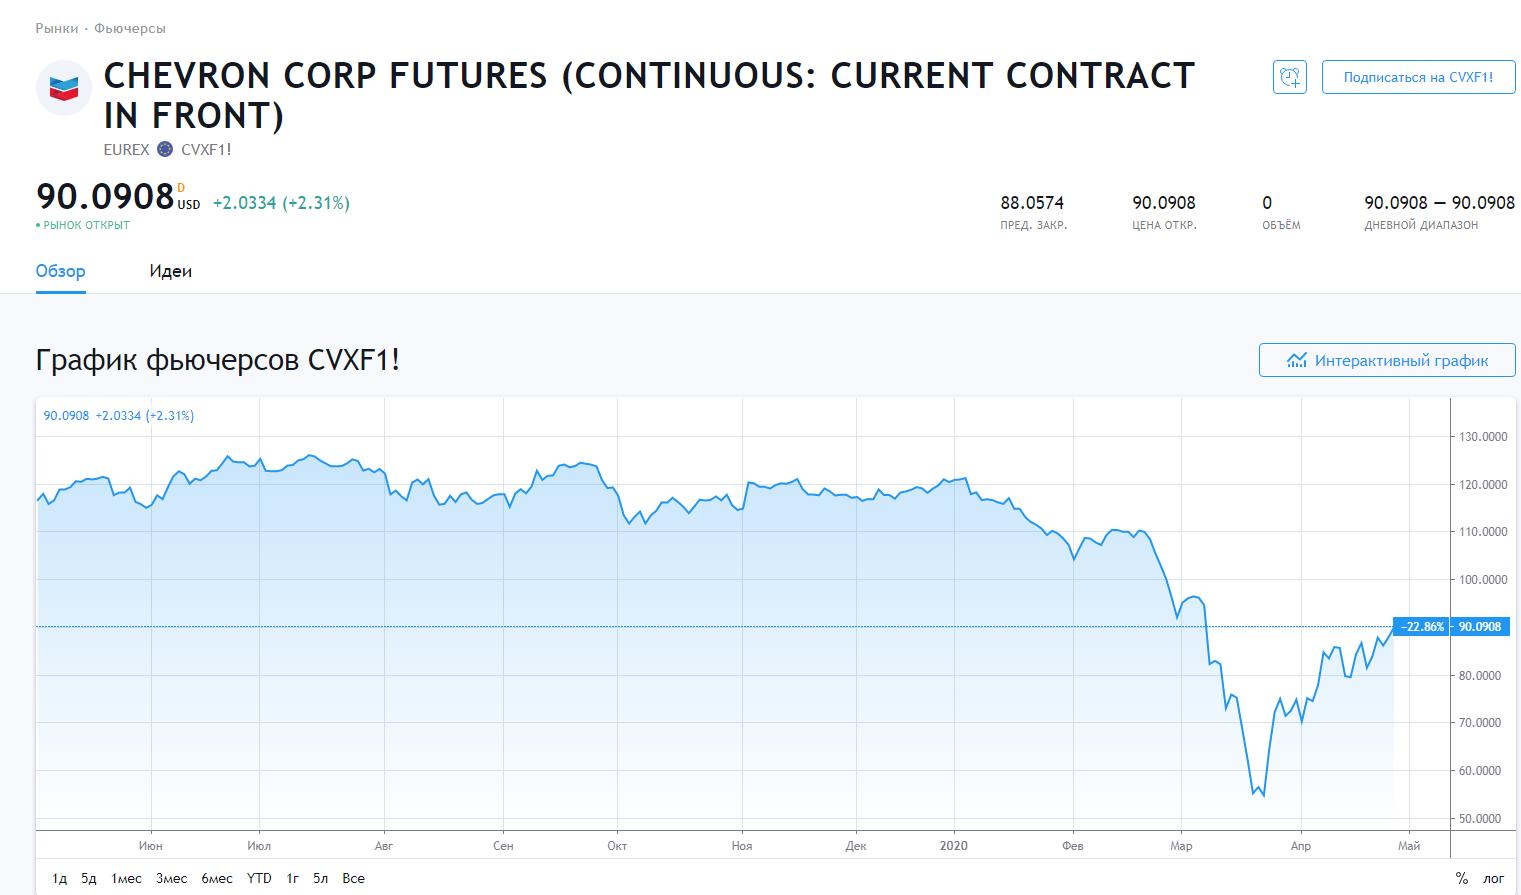 Chevron corp futures